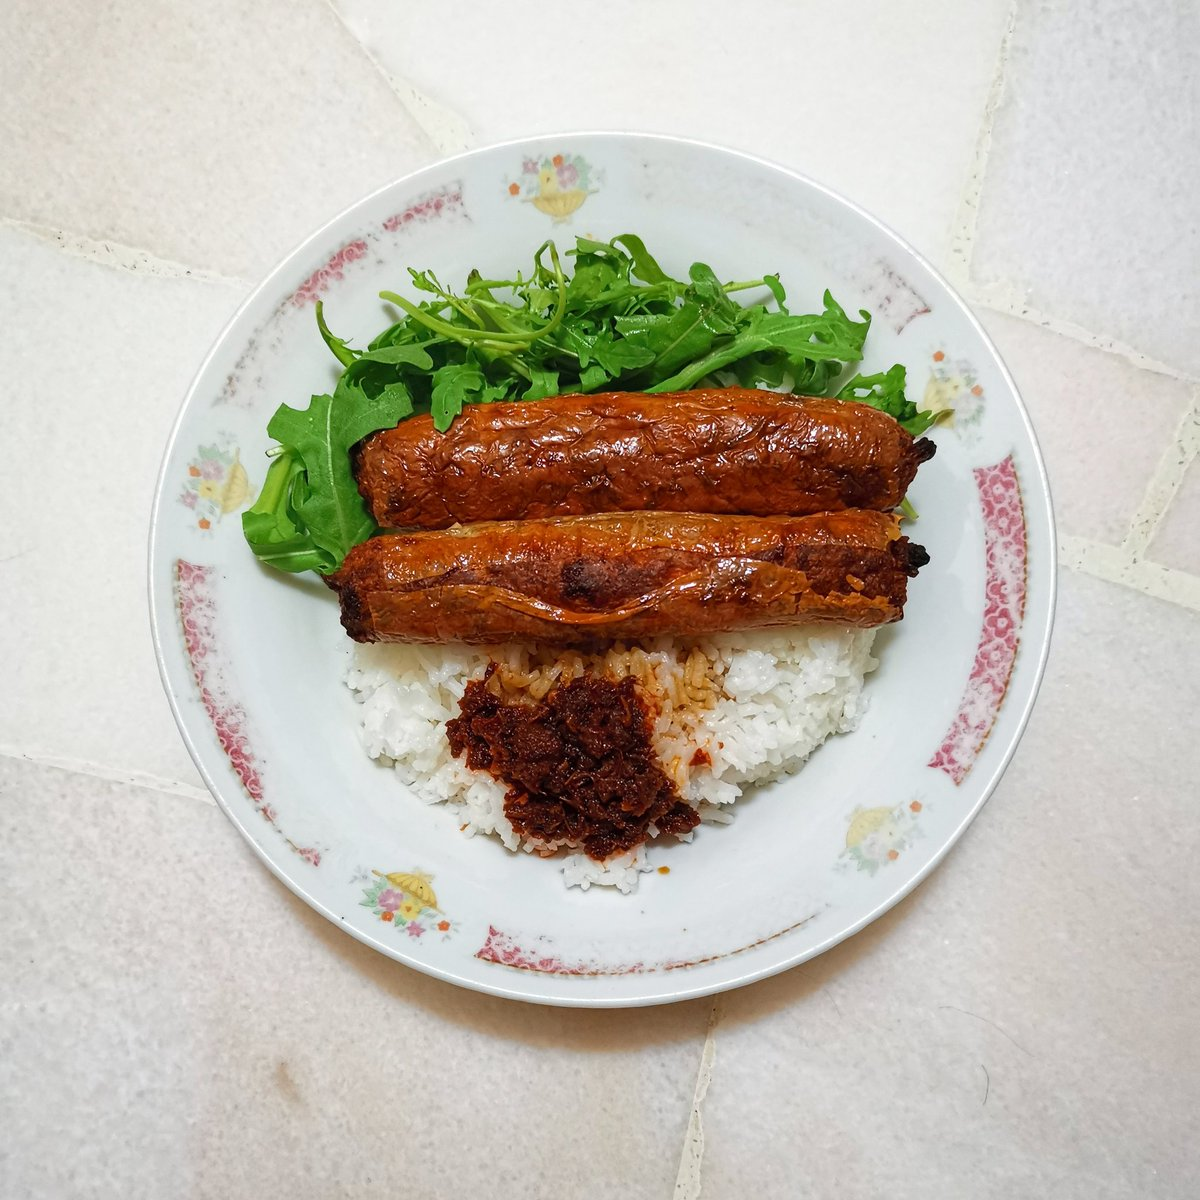 A simple meal #meatroll #arugula #almuerzo #ketodiet #organic #healthy #fitness #lifestyle #coffee #tea #homemade #StayAtHome #eatathome #abendessen #easyrecipes #家常菜 #料理写真 #おいしい #저녁식사 https://t.co/DmN8ABFQ98